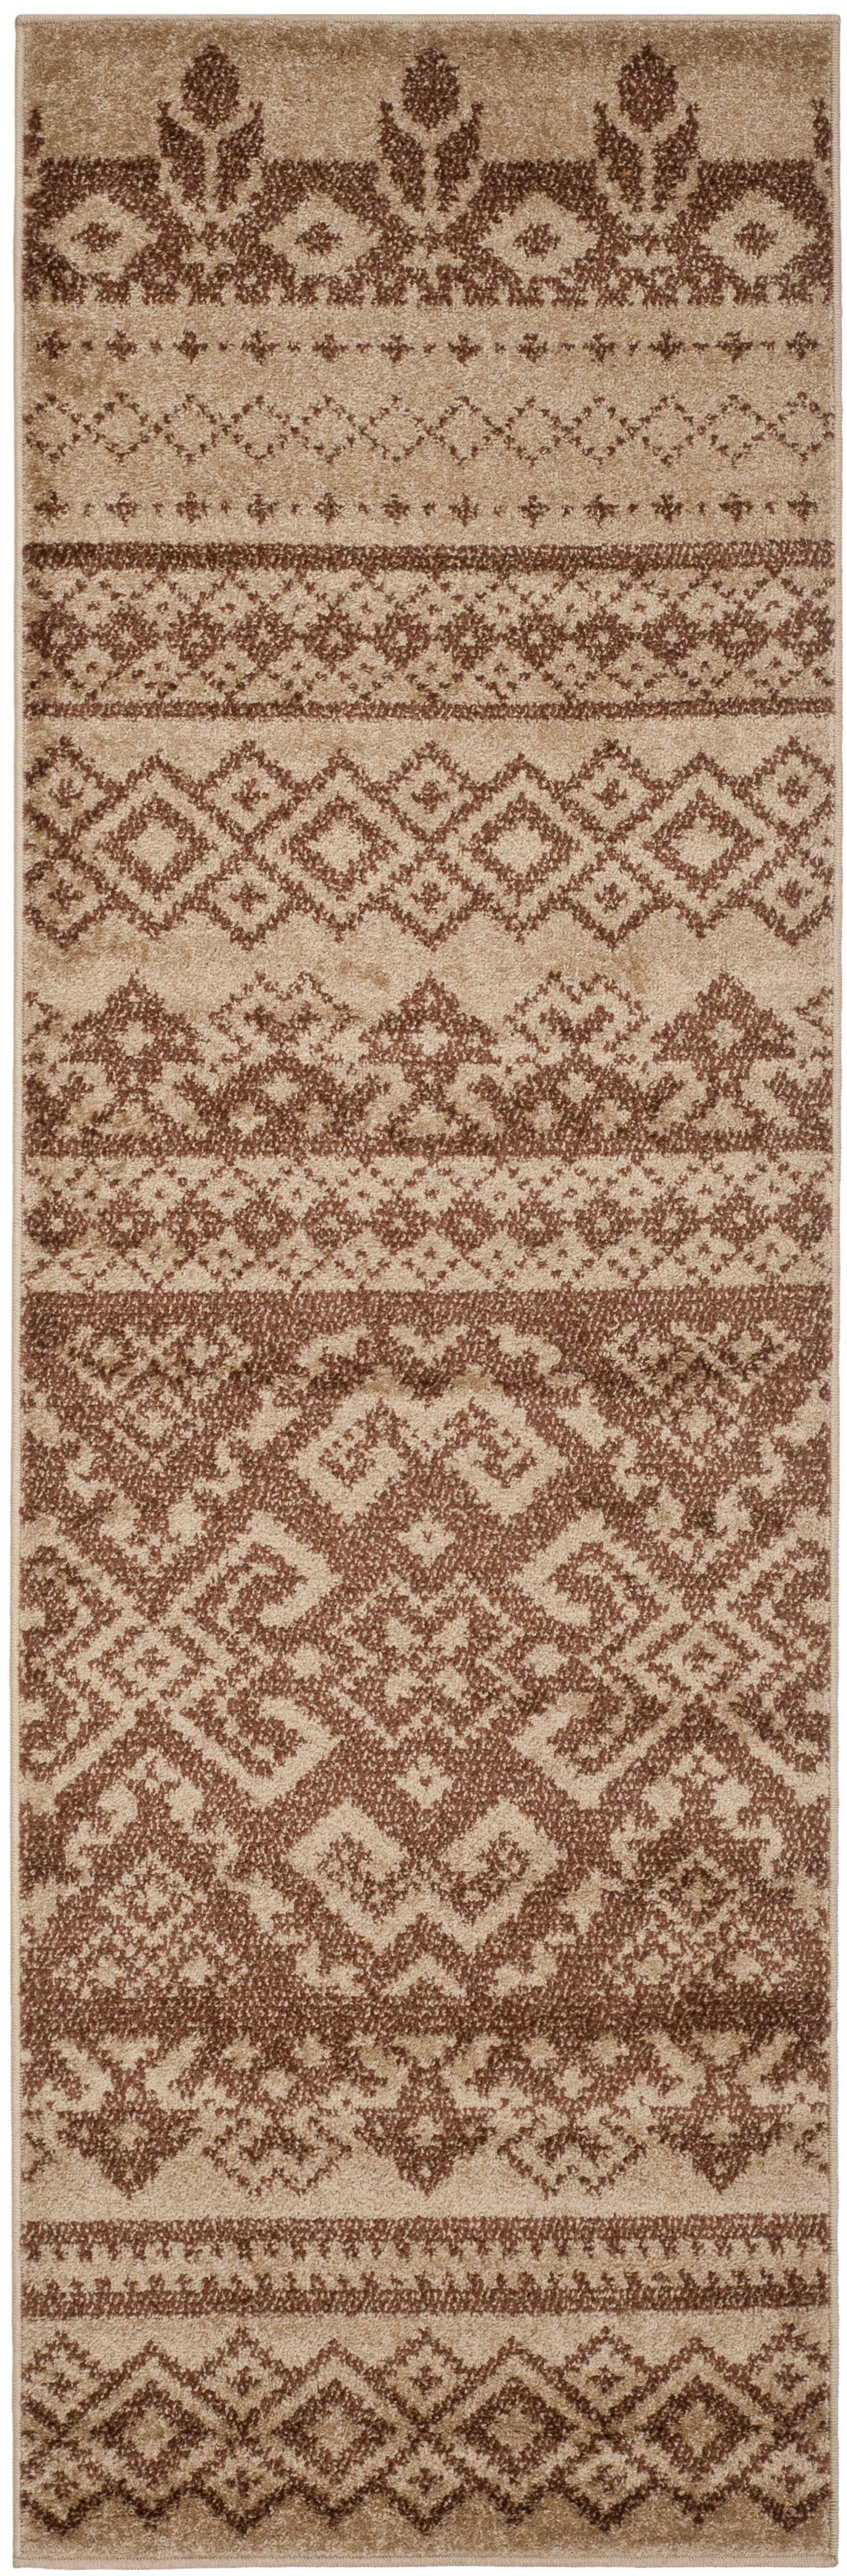 St. Ann Highlands Camel/Chocolate Area Rug Rug Size: Runner 2'6